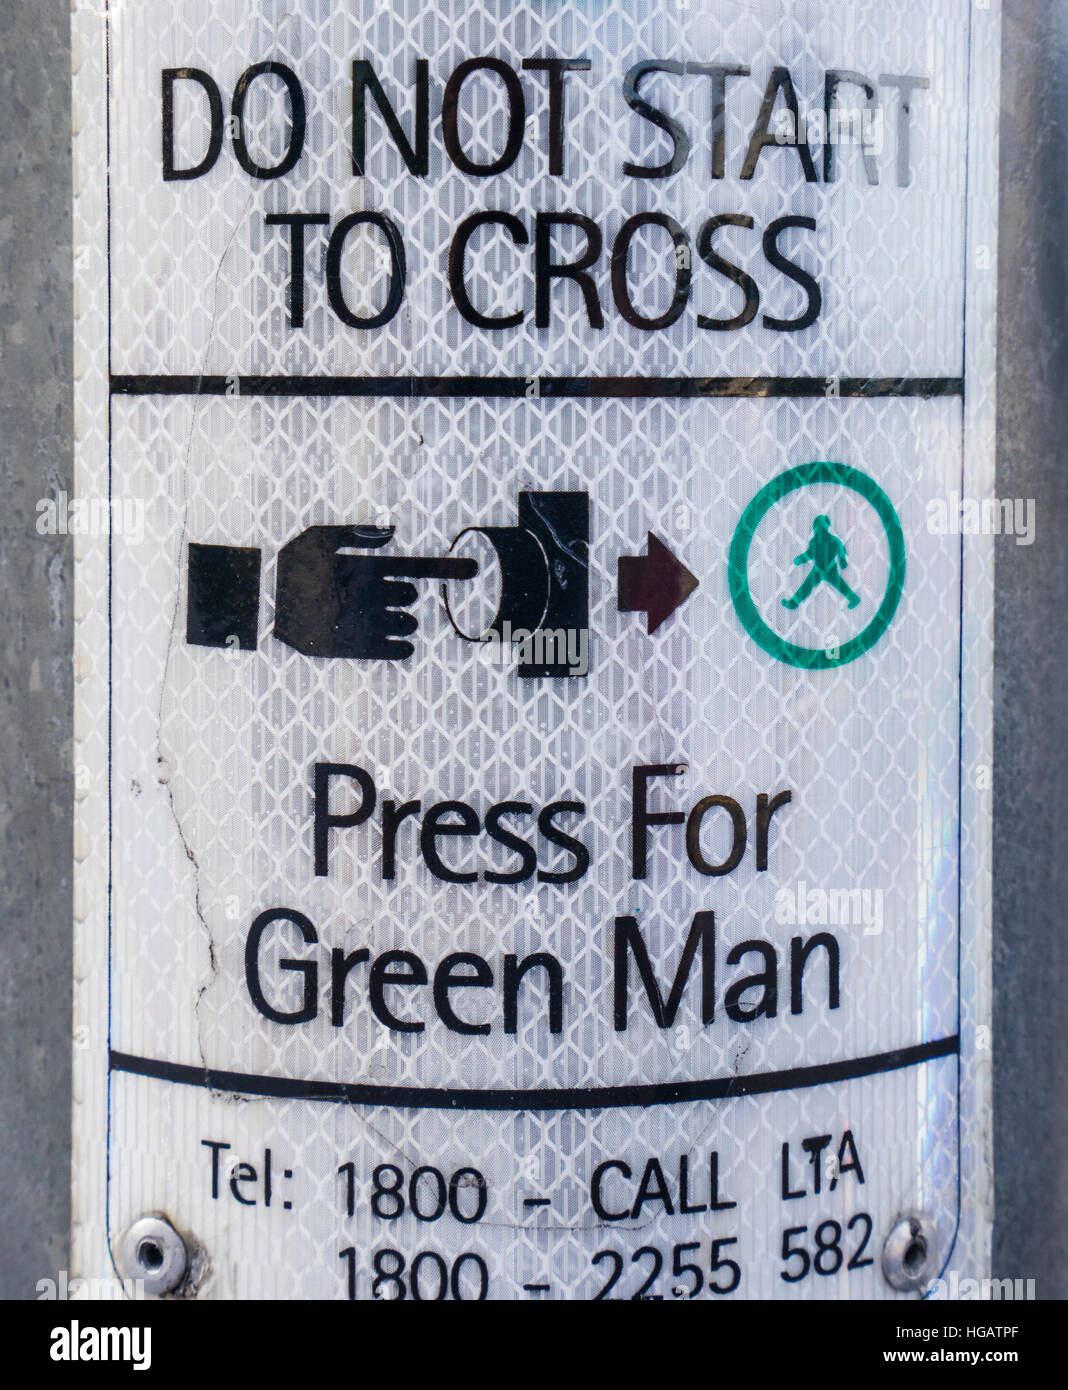 Singapore pedestrian crossing regulation: Press for Green Man - Stock Image